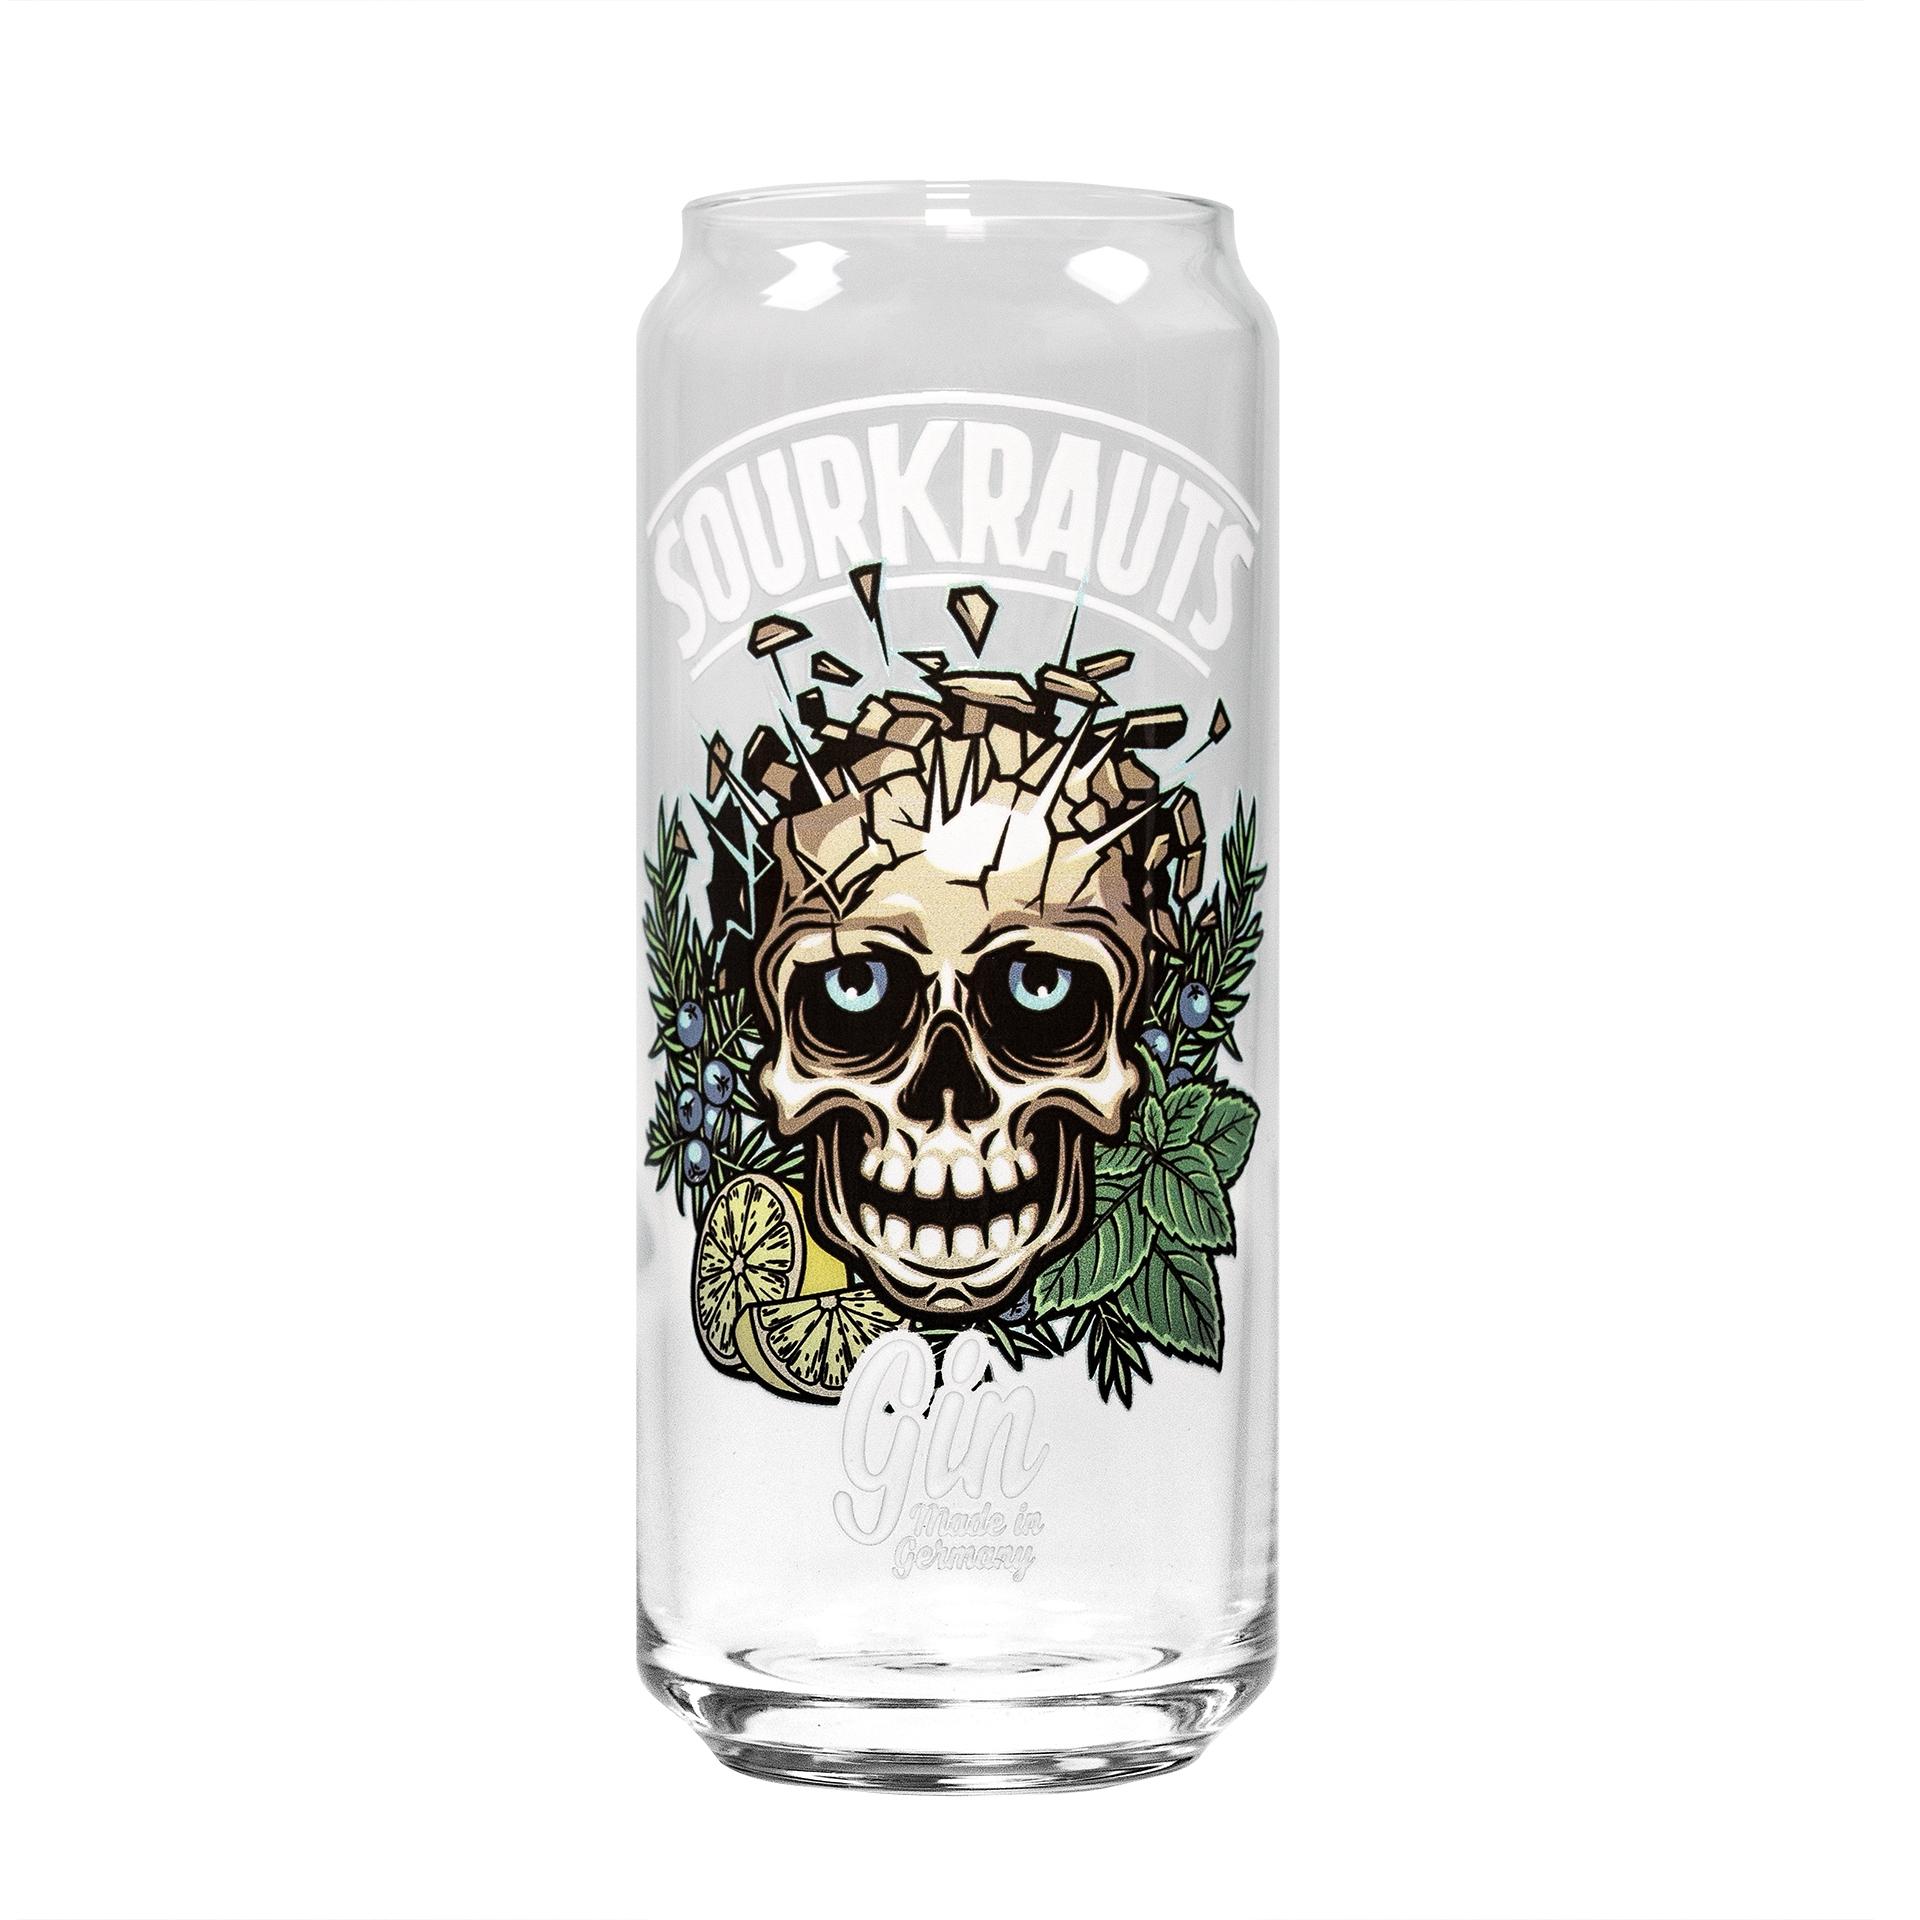 Cocktailglas   Sourkrauts Gin   0,47L